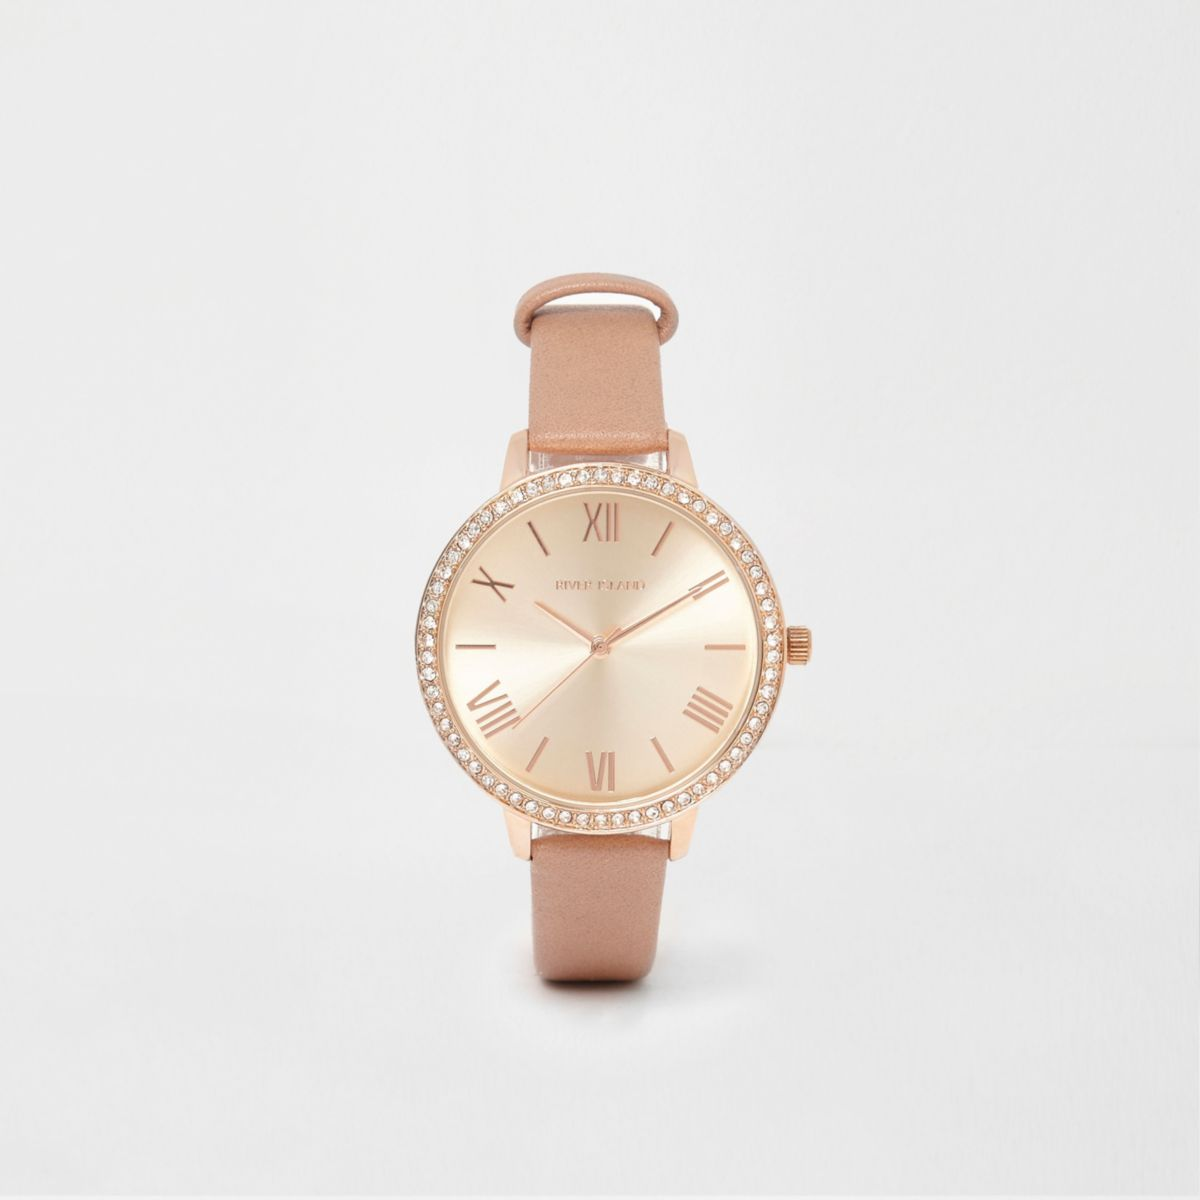 Beige en roségoudkleurig horloge met diamantjes